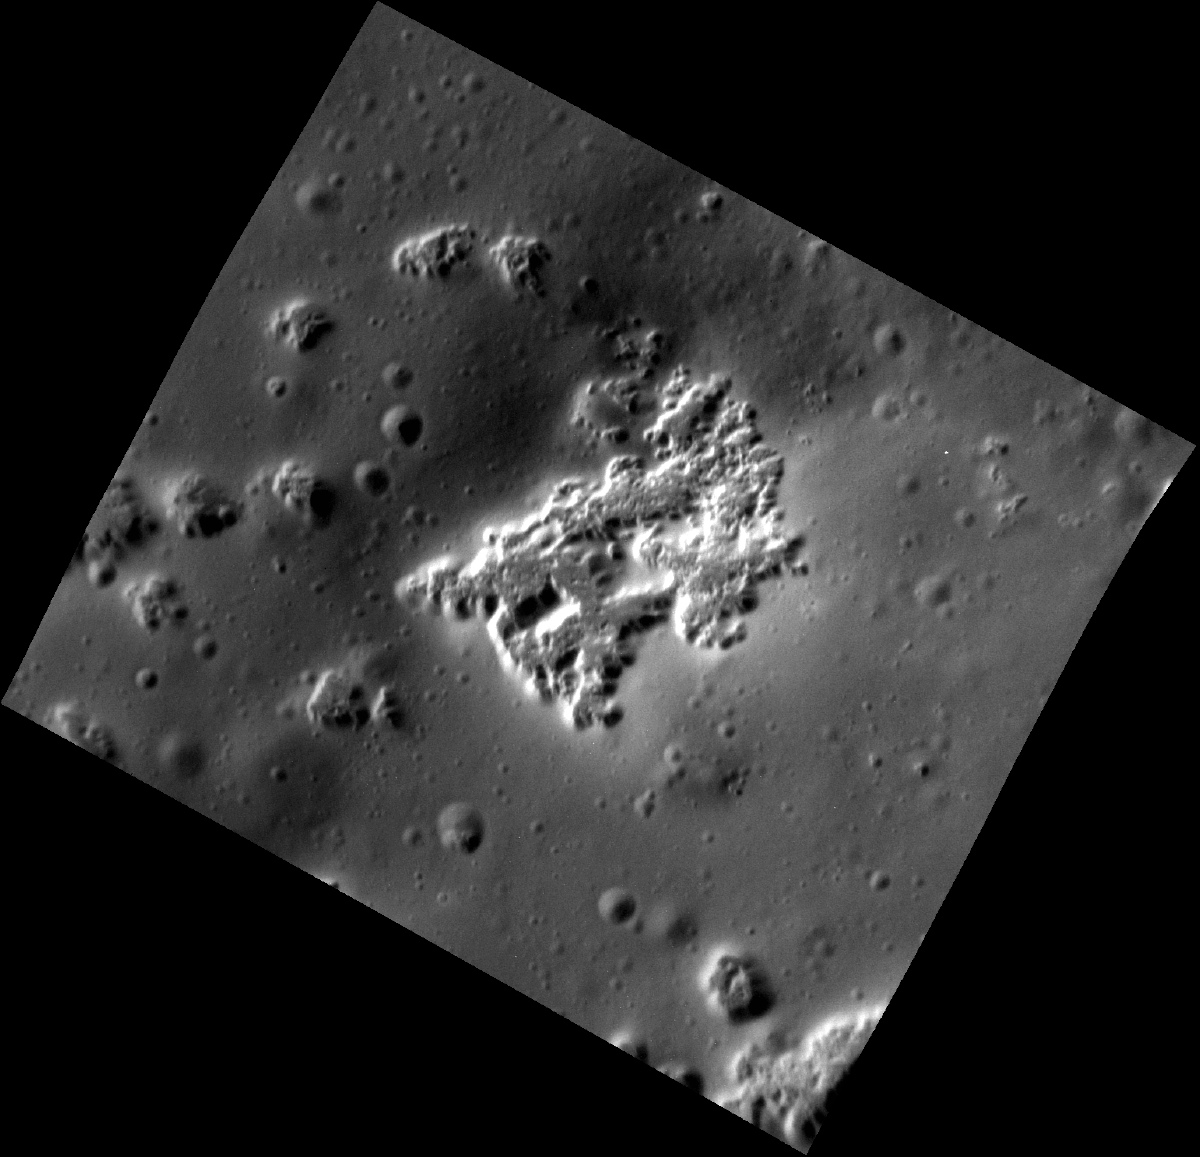 Mercury Scarlatti Basin Hollows